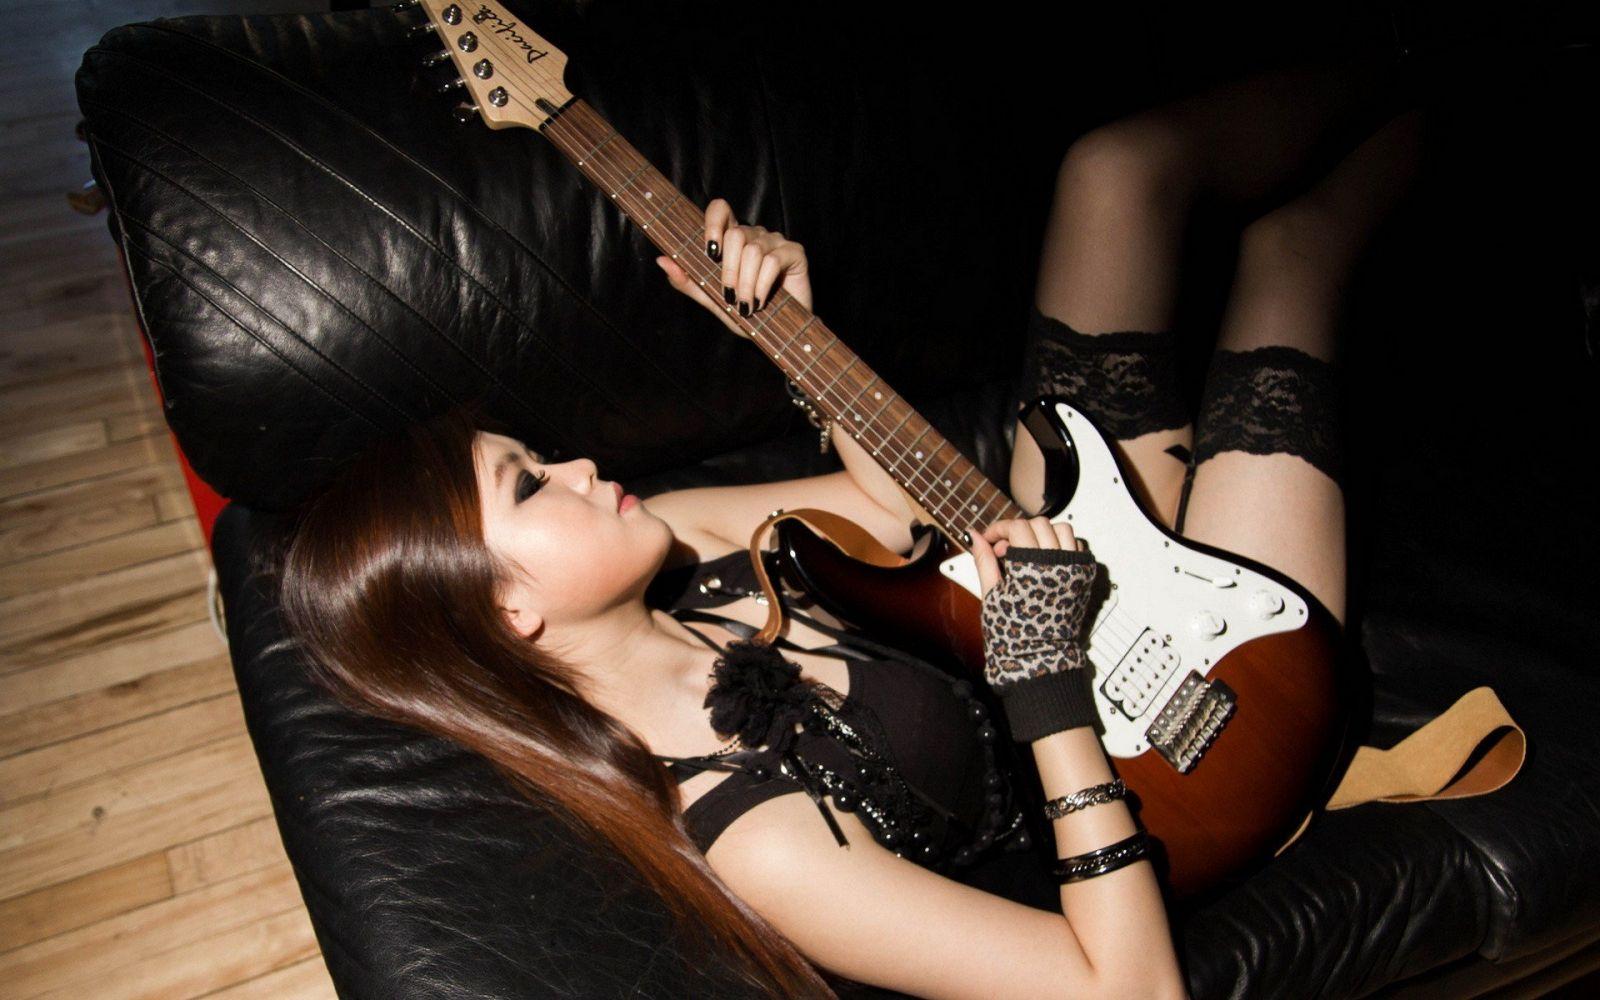 black-rocker-girls-nude-petite